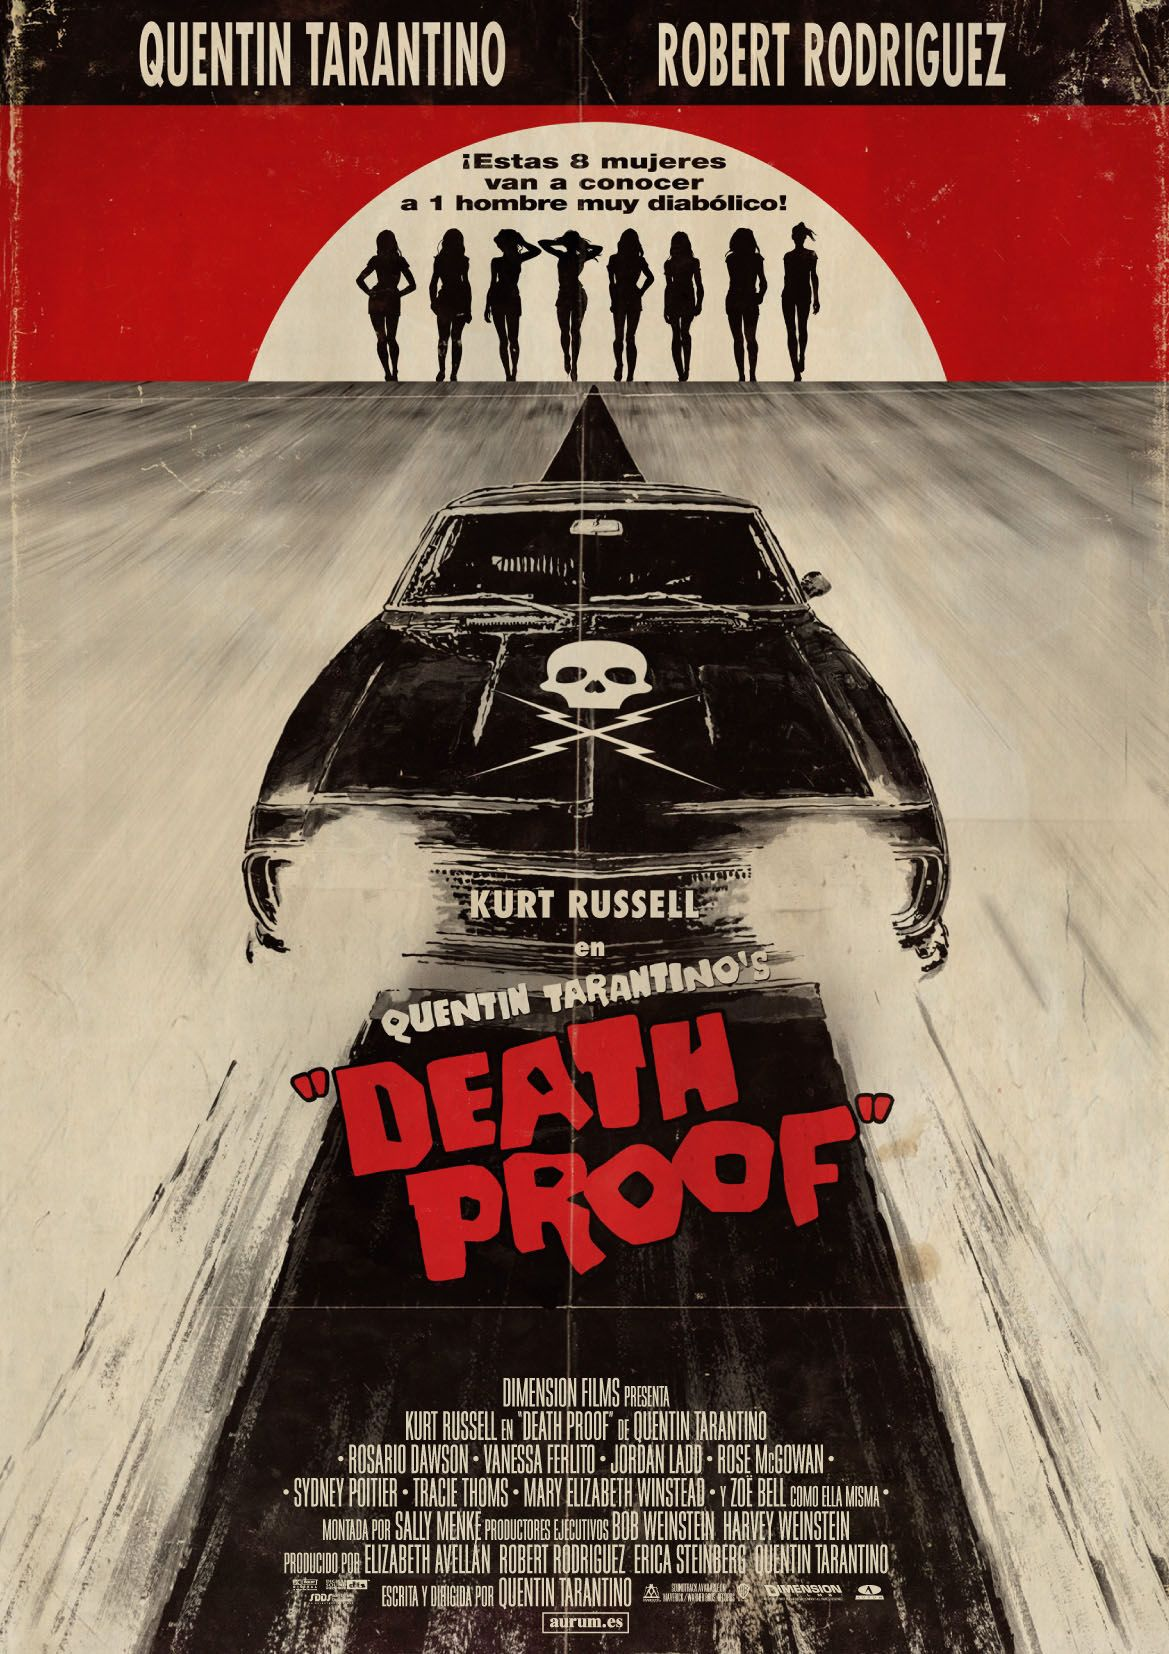 Death Proof - Quentin Tarantino (2007).